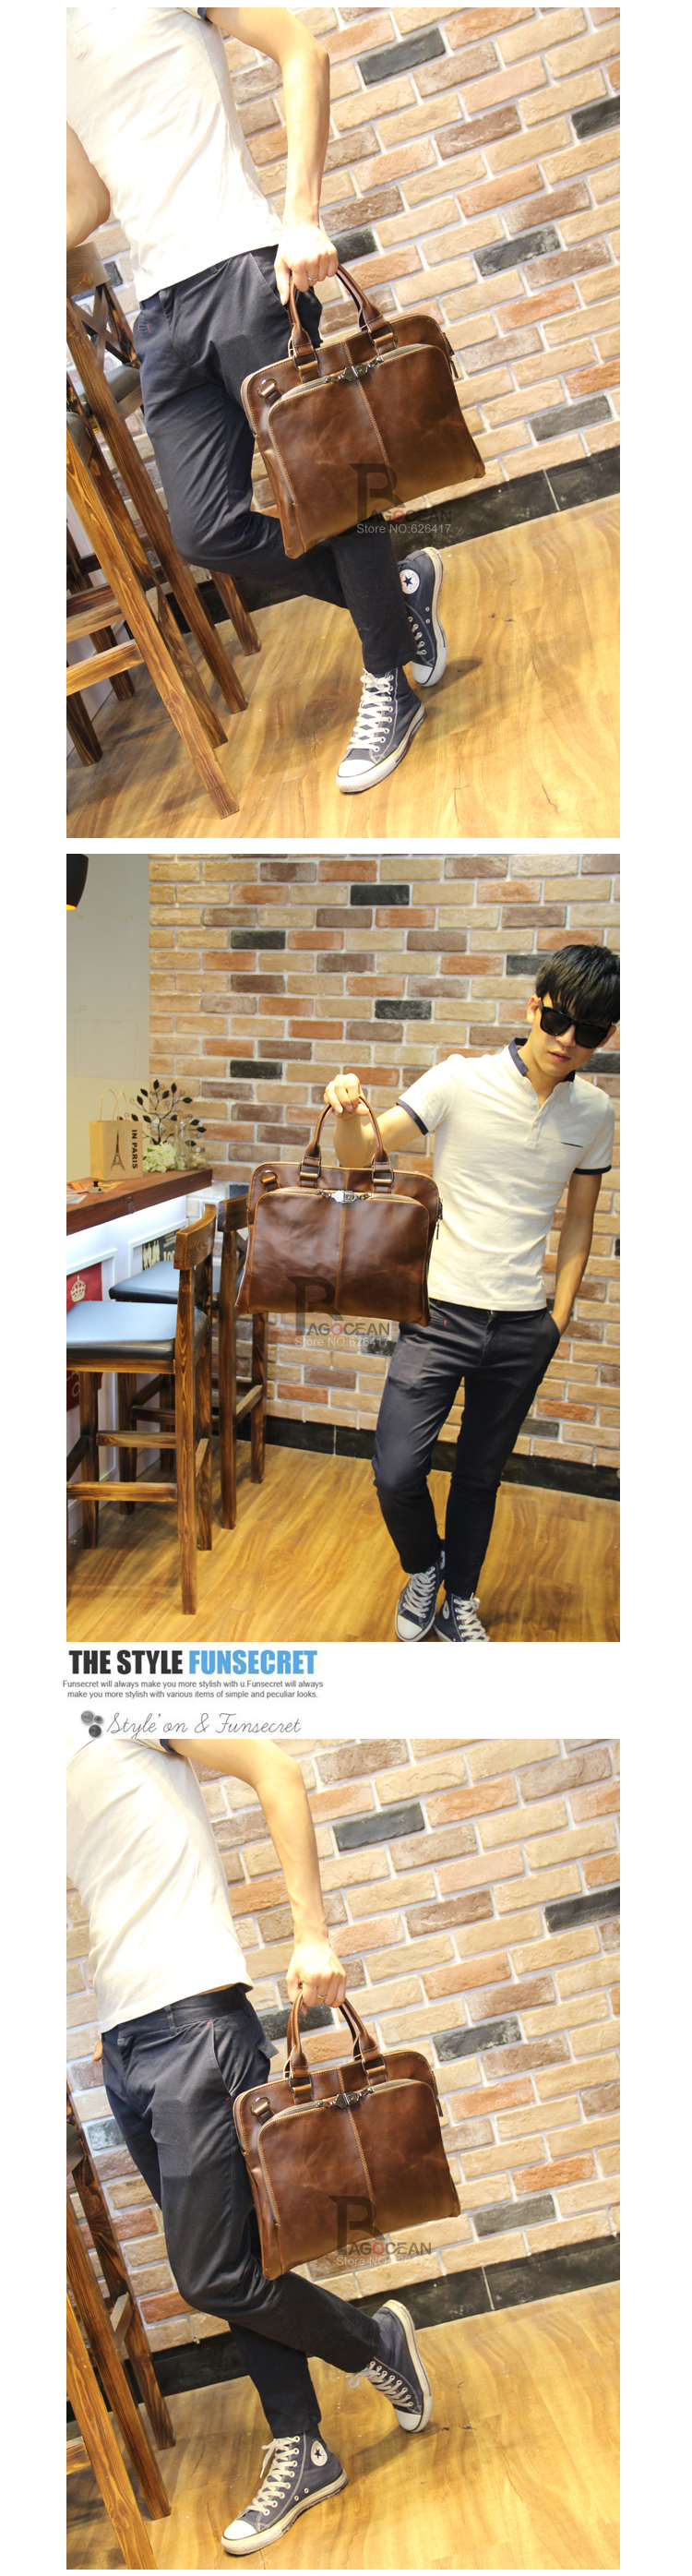 "New high quality pu leather Shoulder leisure men's bag business messenger portable briefcase Laptop large Purse 14"" Handbag 7"